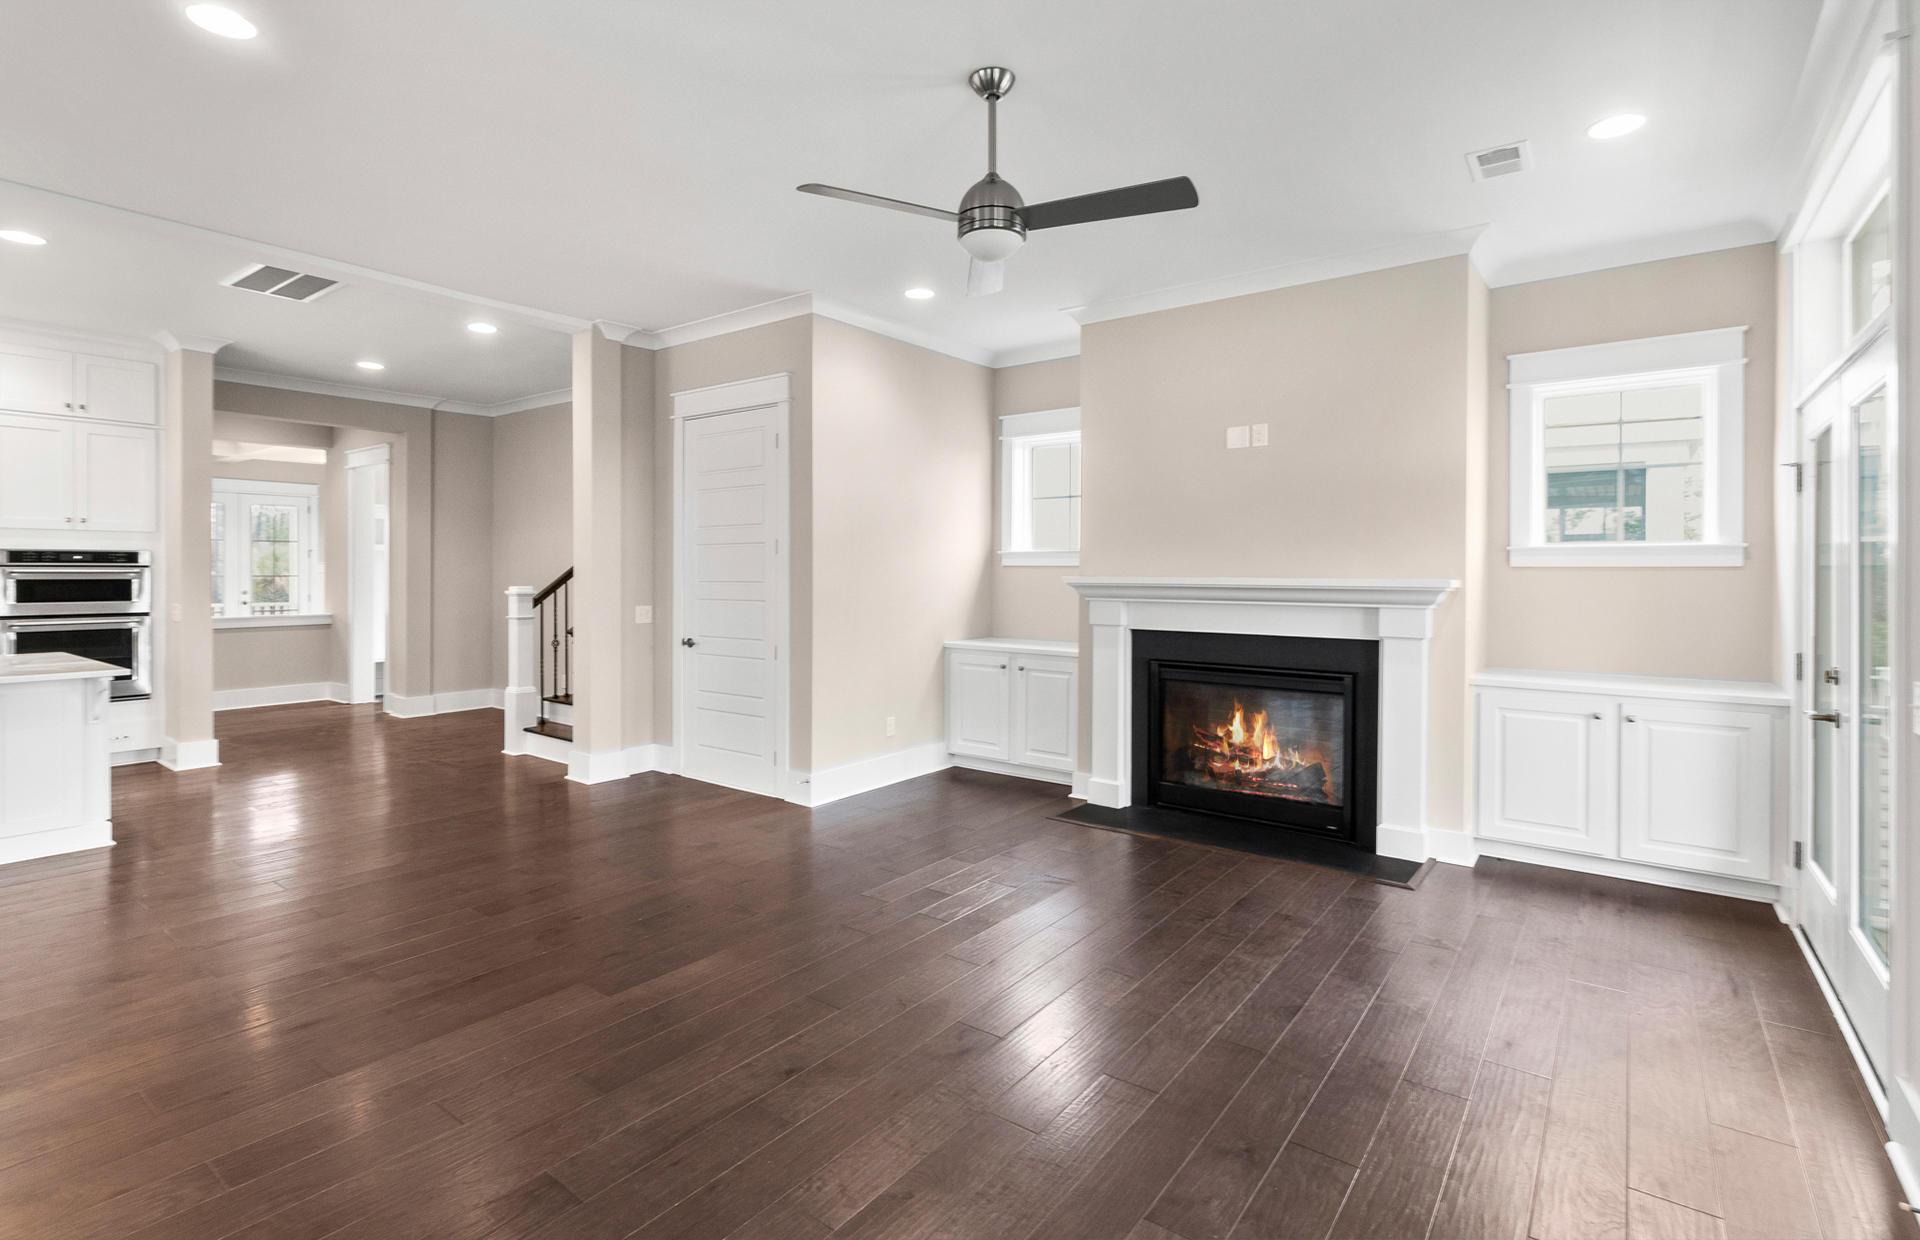 Dunes West Homes For Sale - 2320 Bucktail, Mount Pleasant, SC - 4